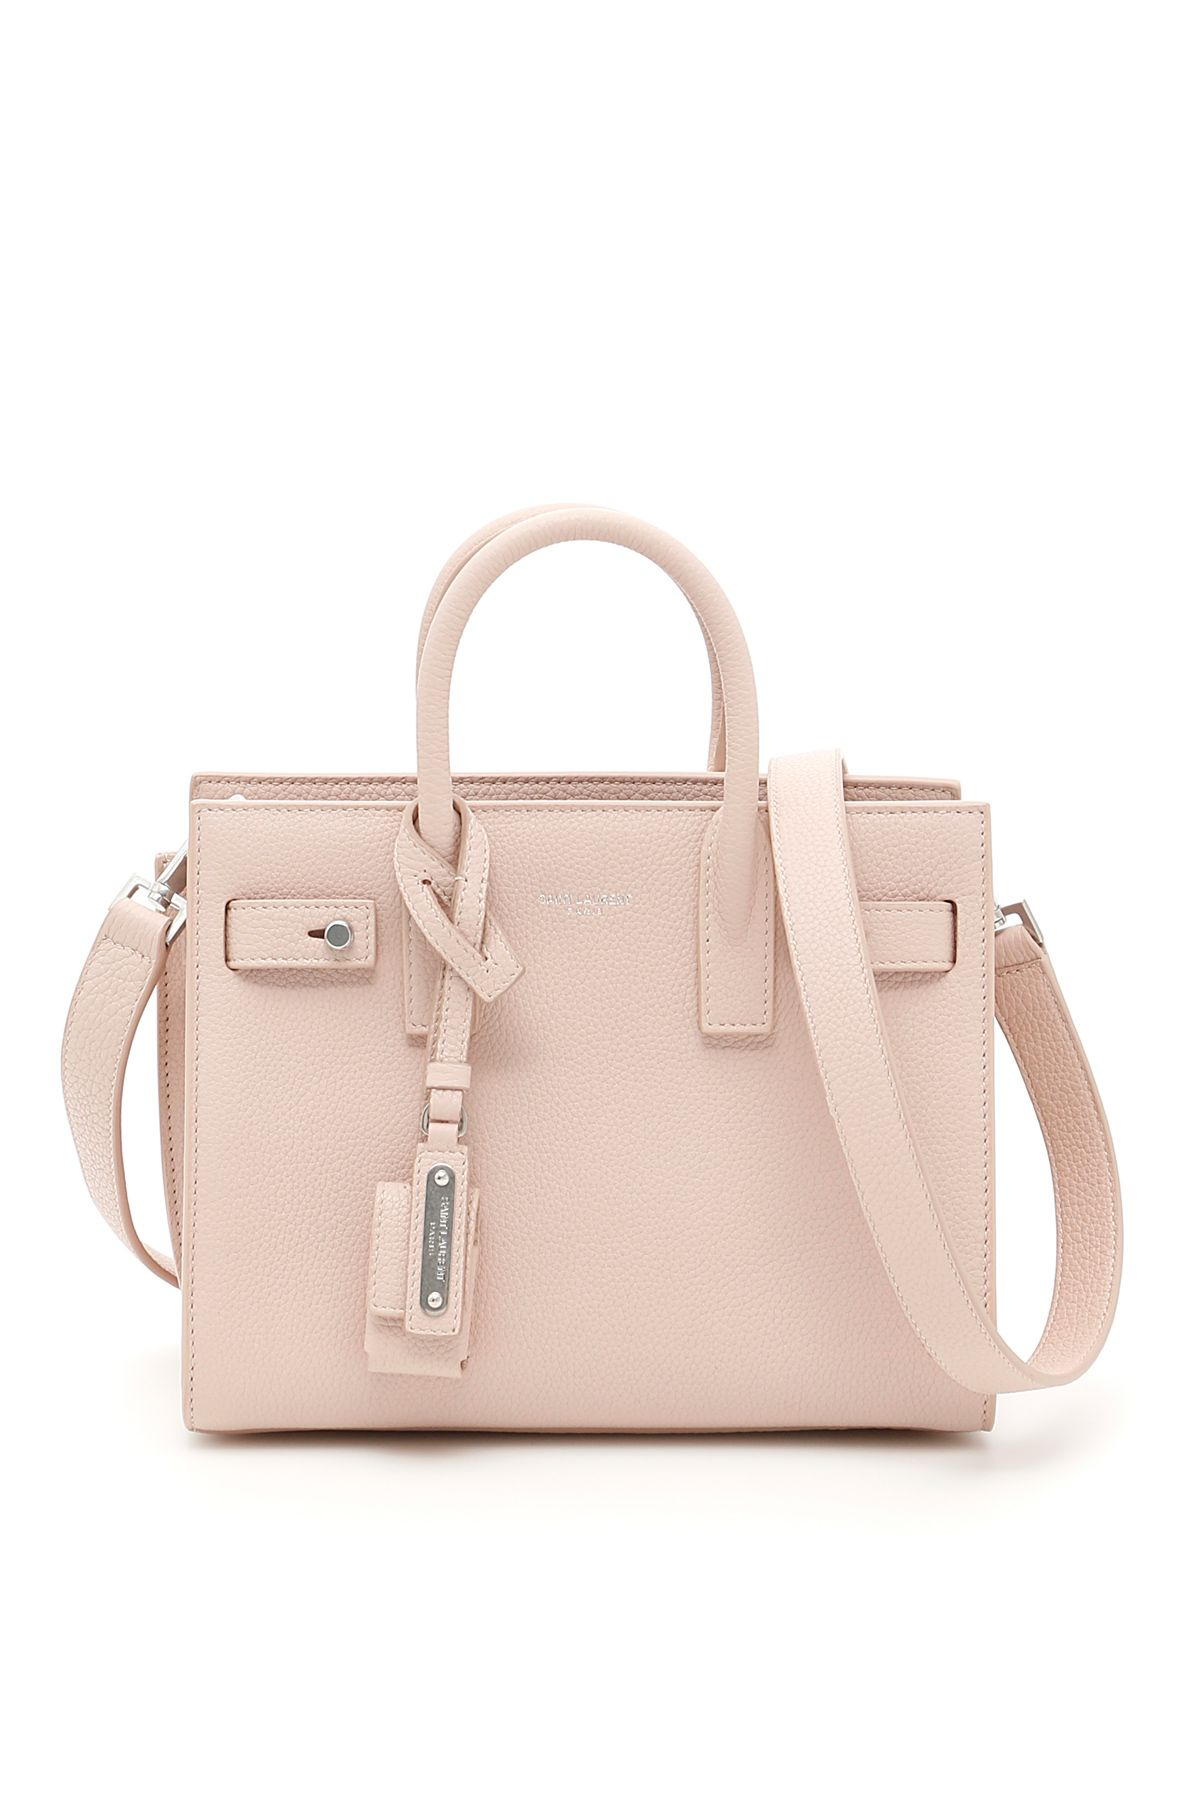 Saint Laurent Nano Sac De Jour Bag In Marble Pinkrosa  3d1a38f76bb73